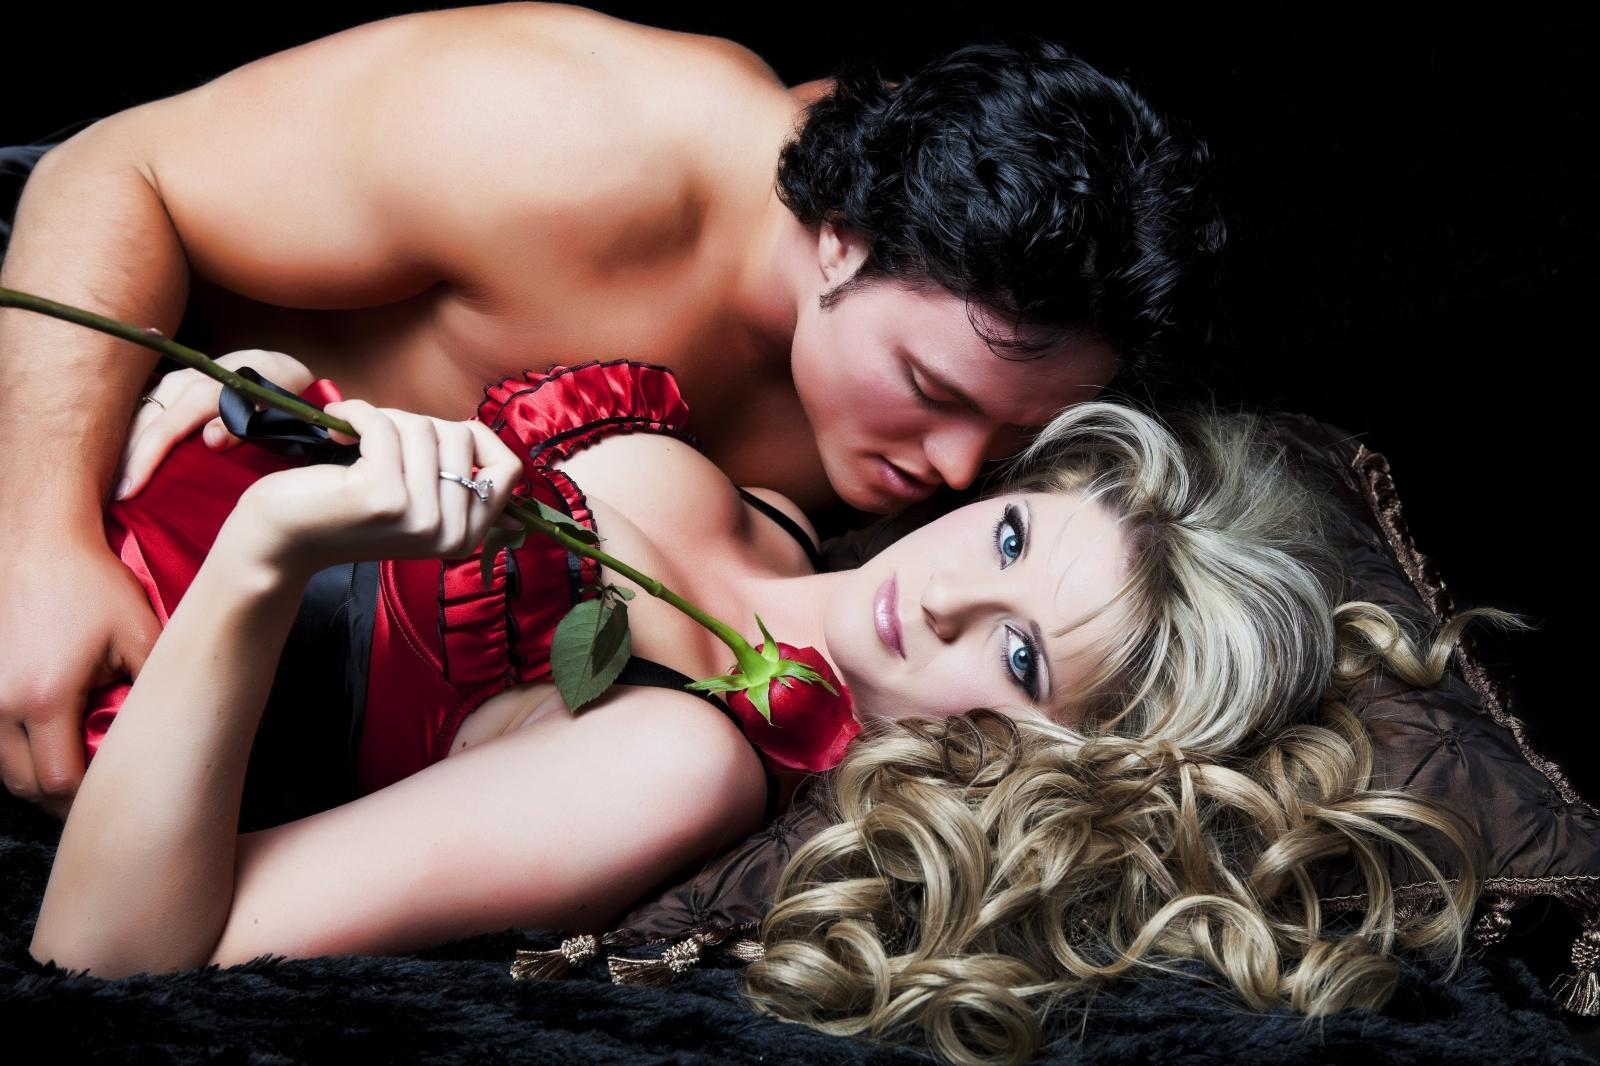 Жопу видео открытки эротические